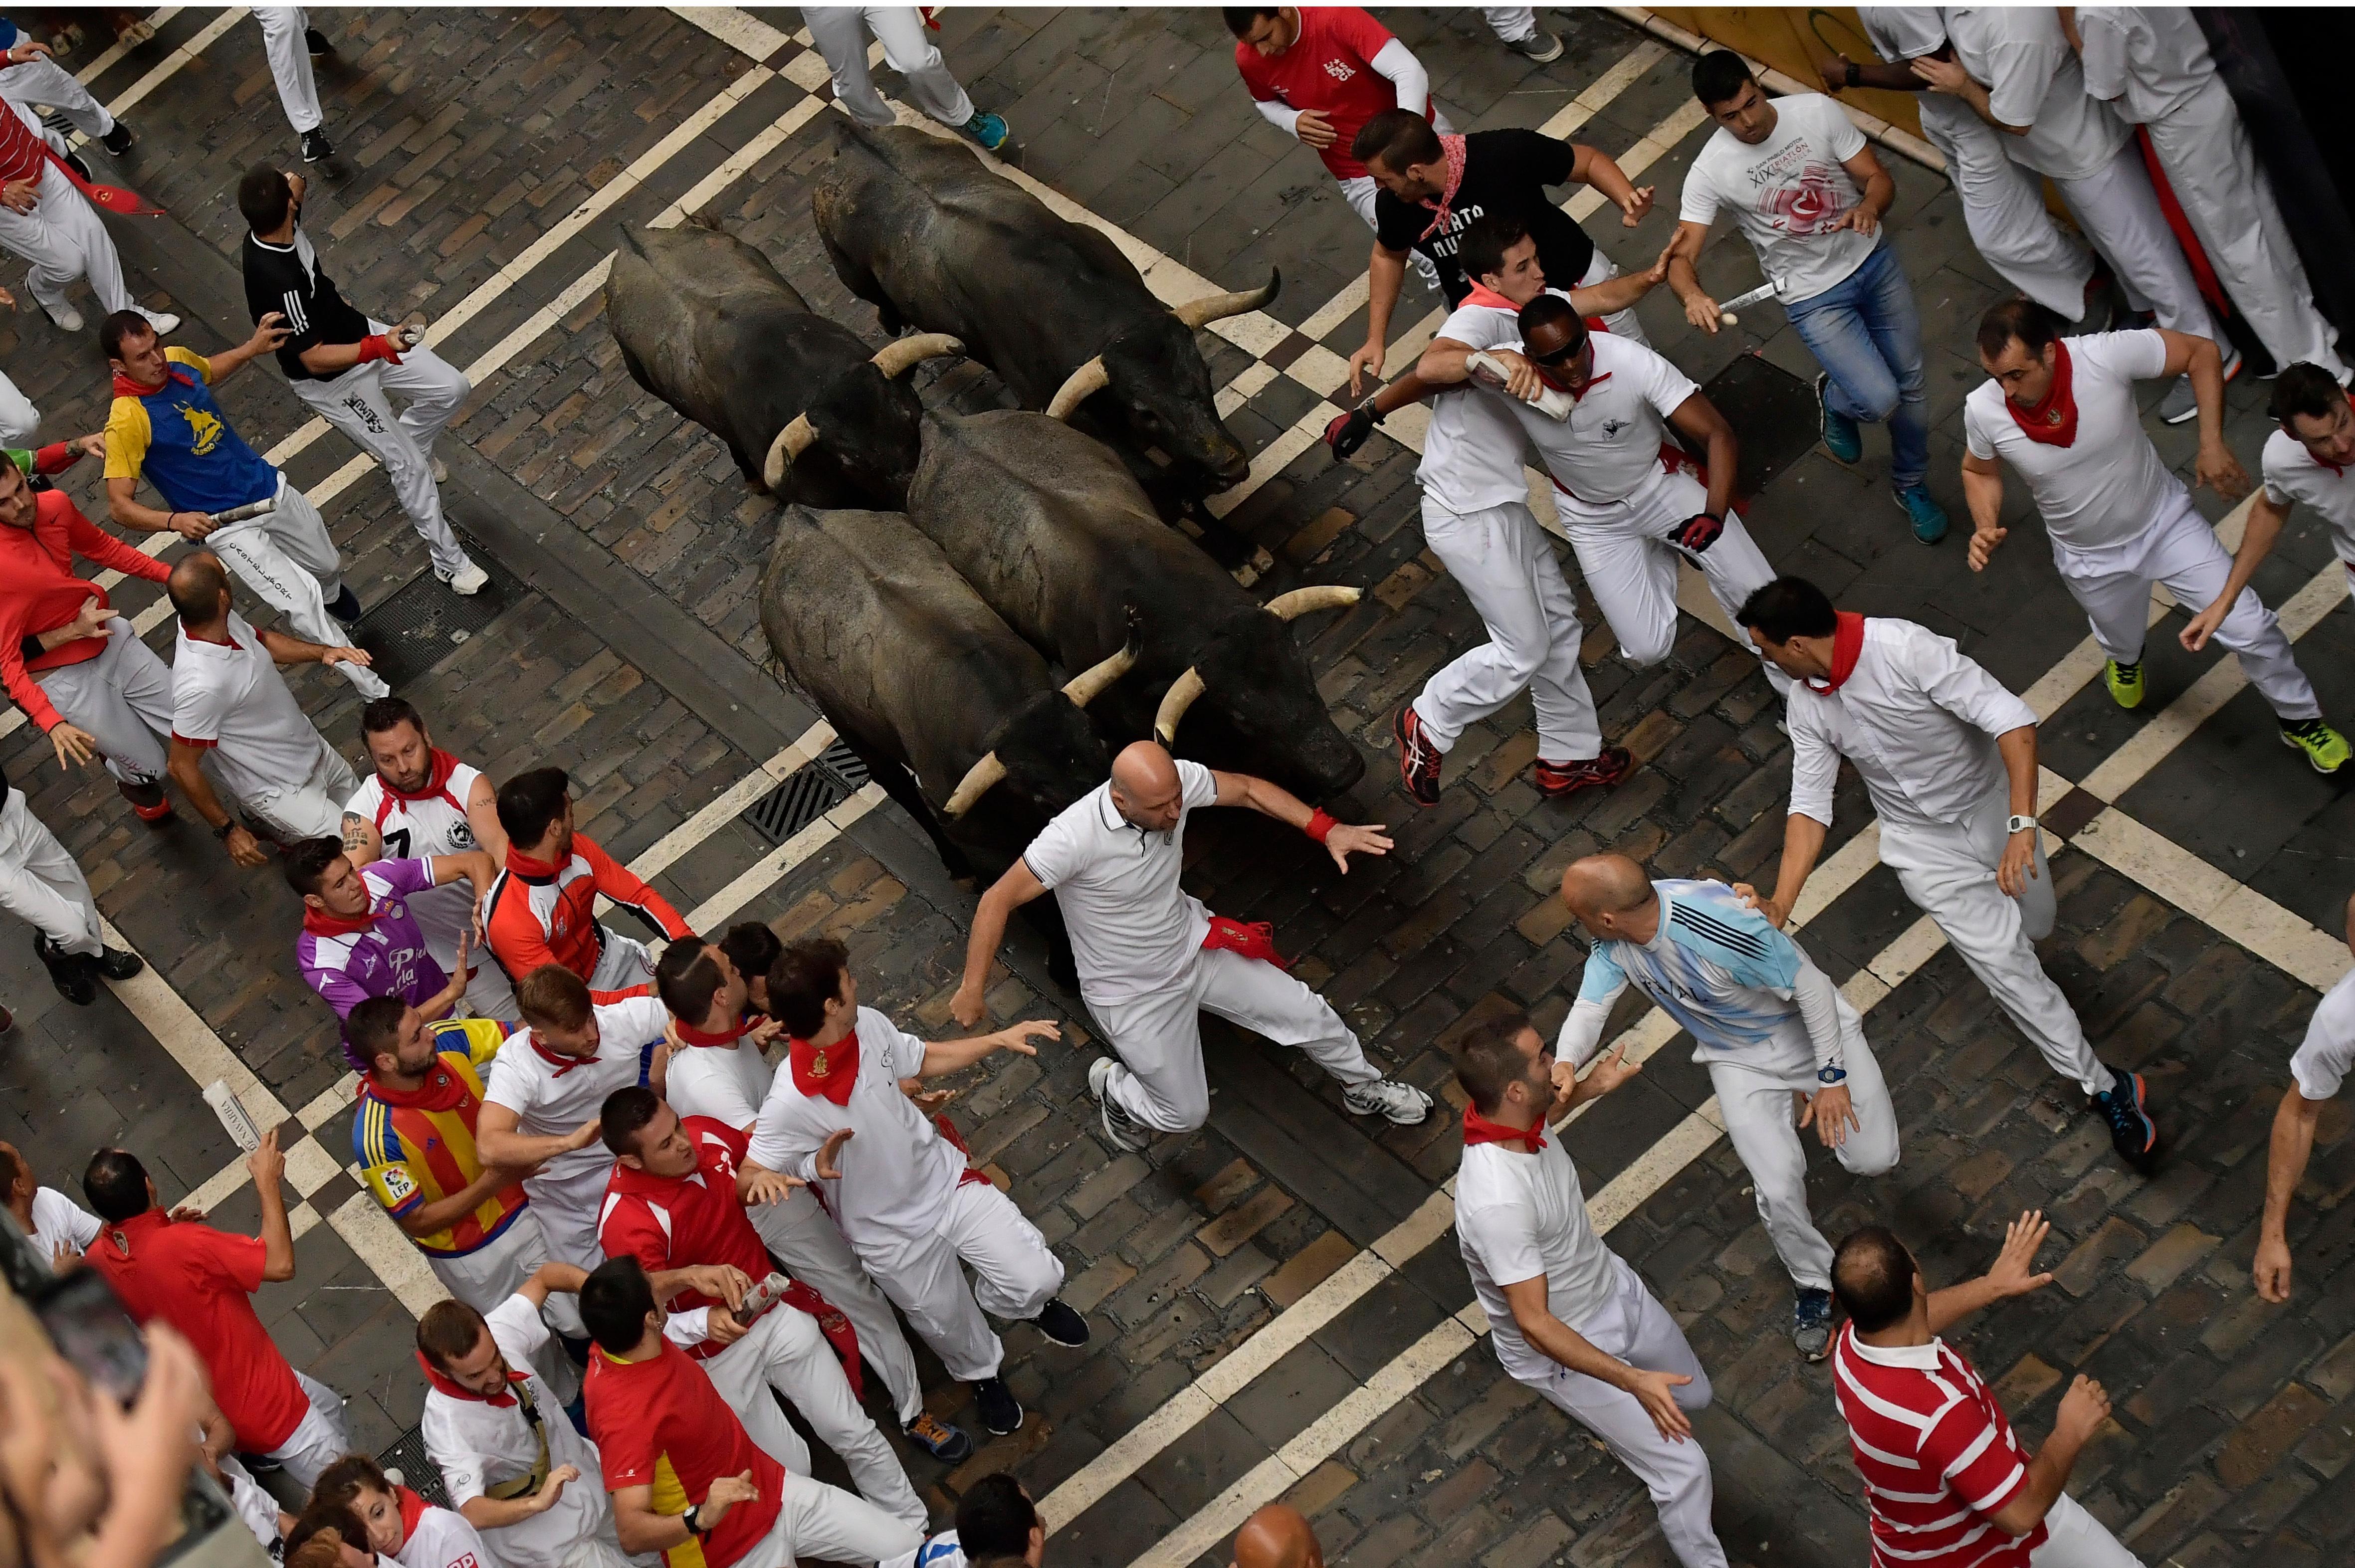 2 americans gored in pamplona u0026 39 s second bull run of 2017